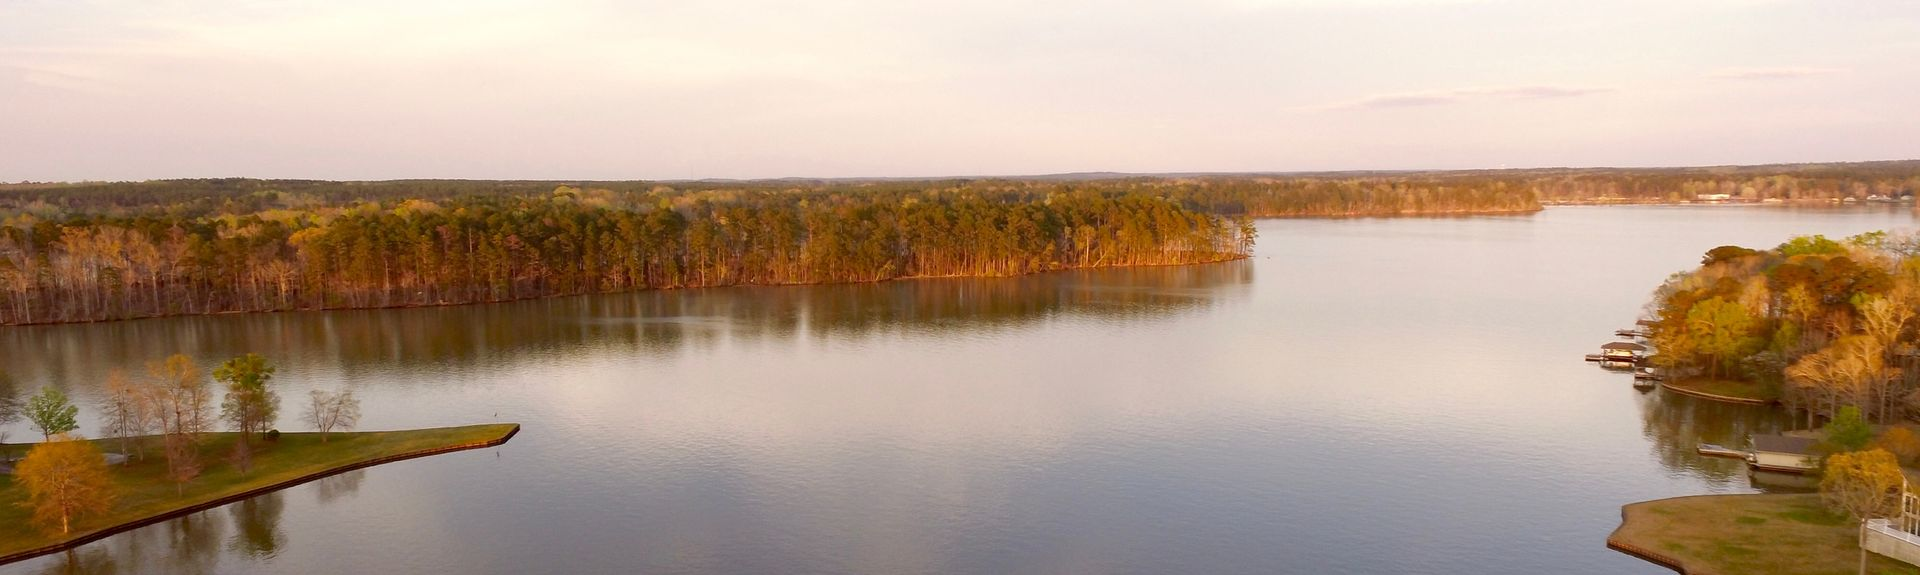 Lake Sinclair, Georgia, United States of America